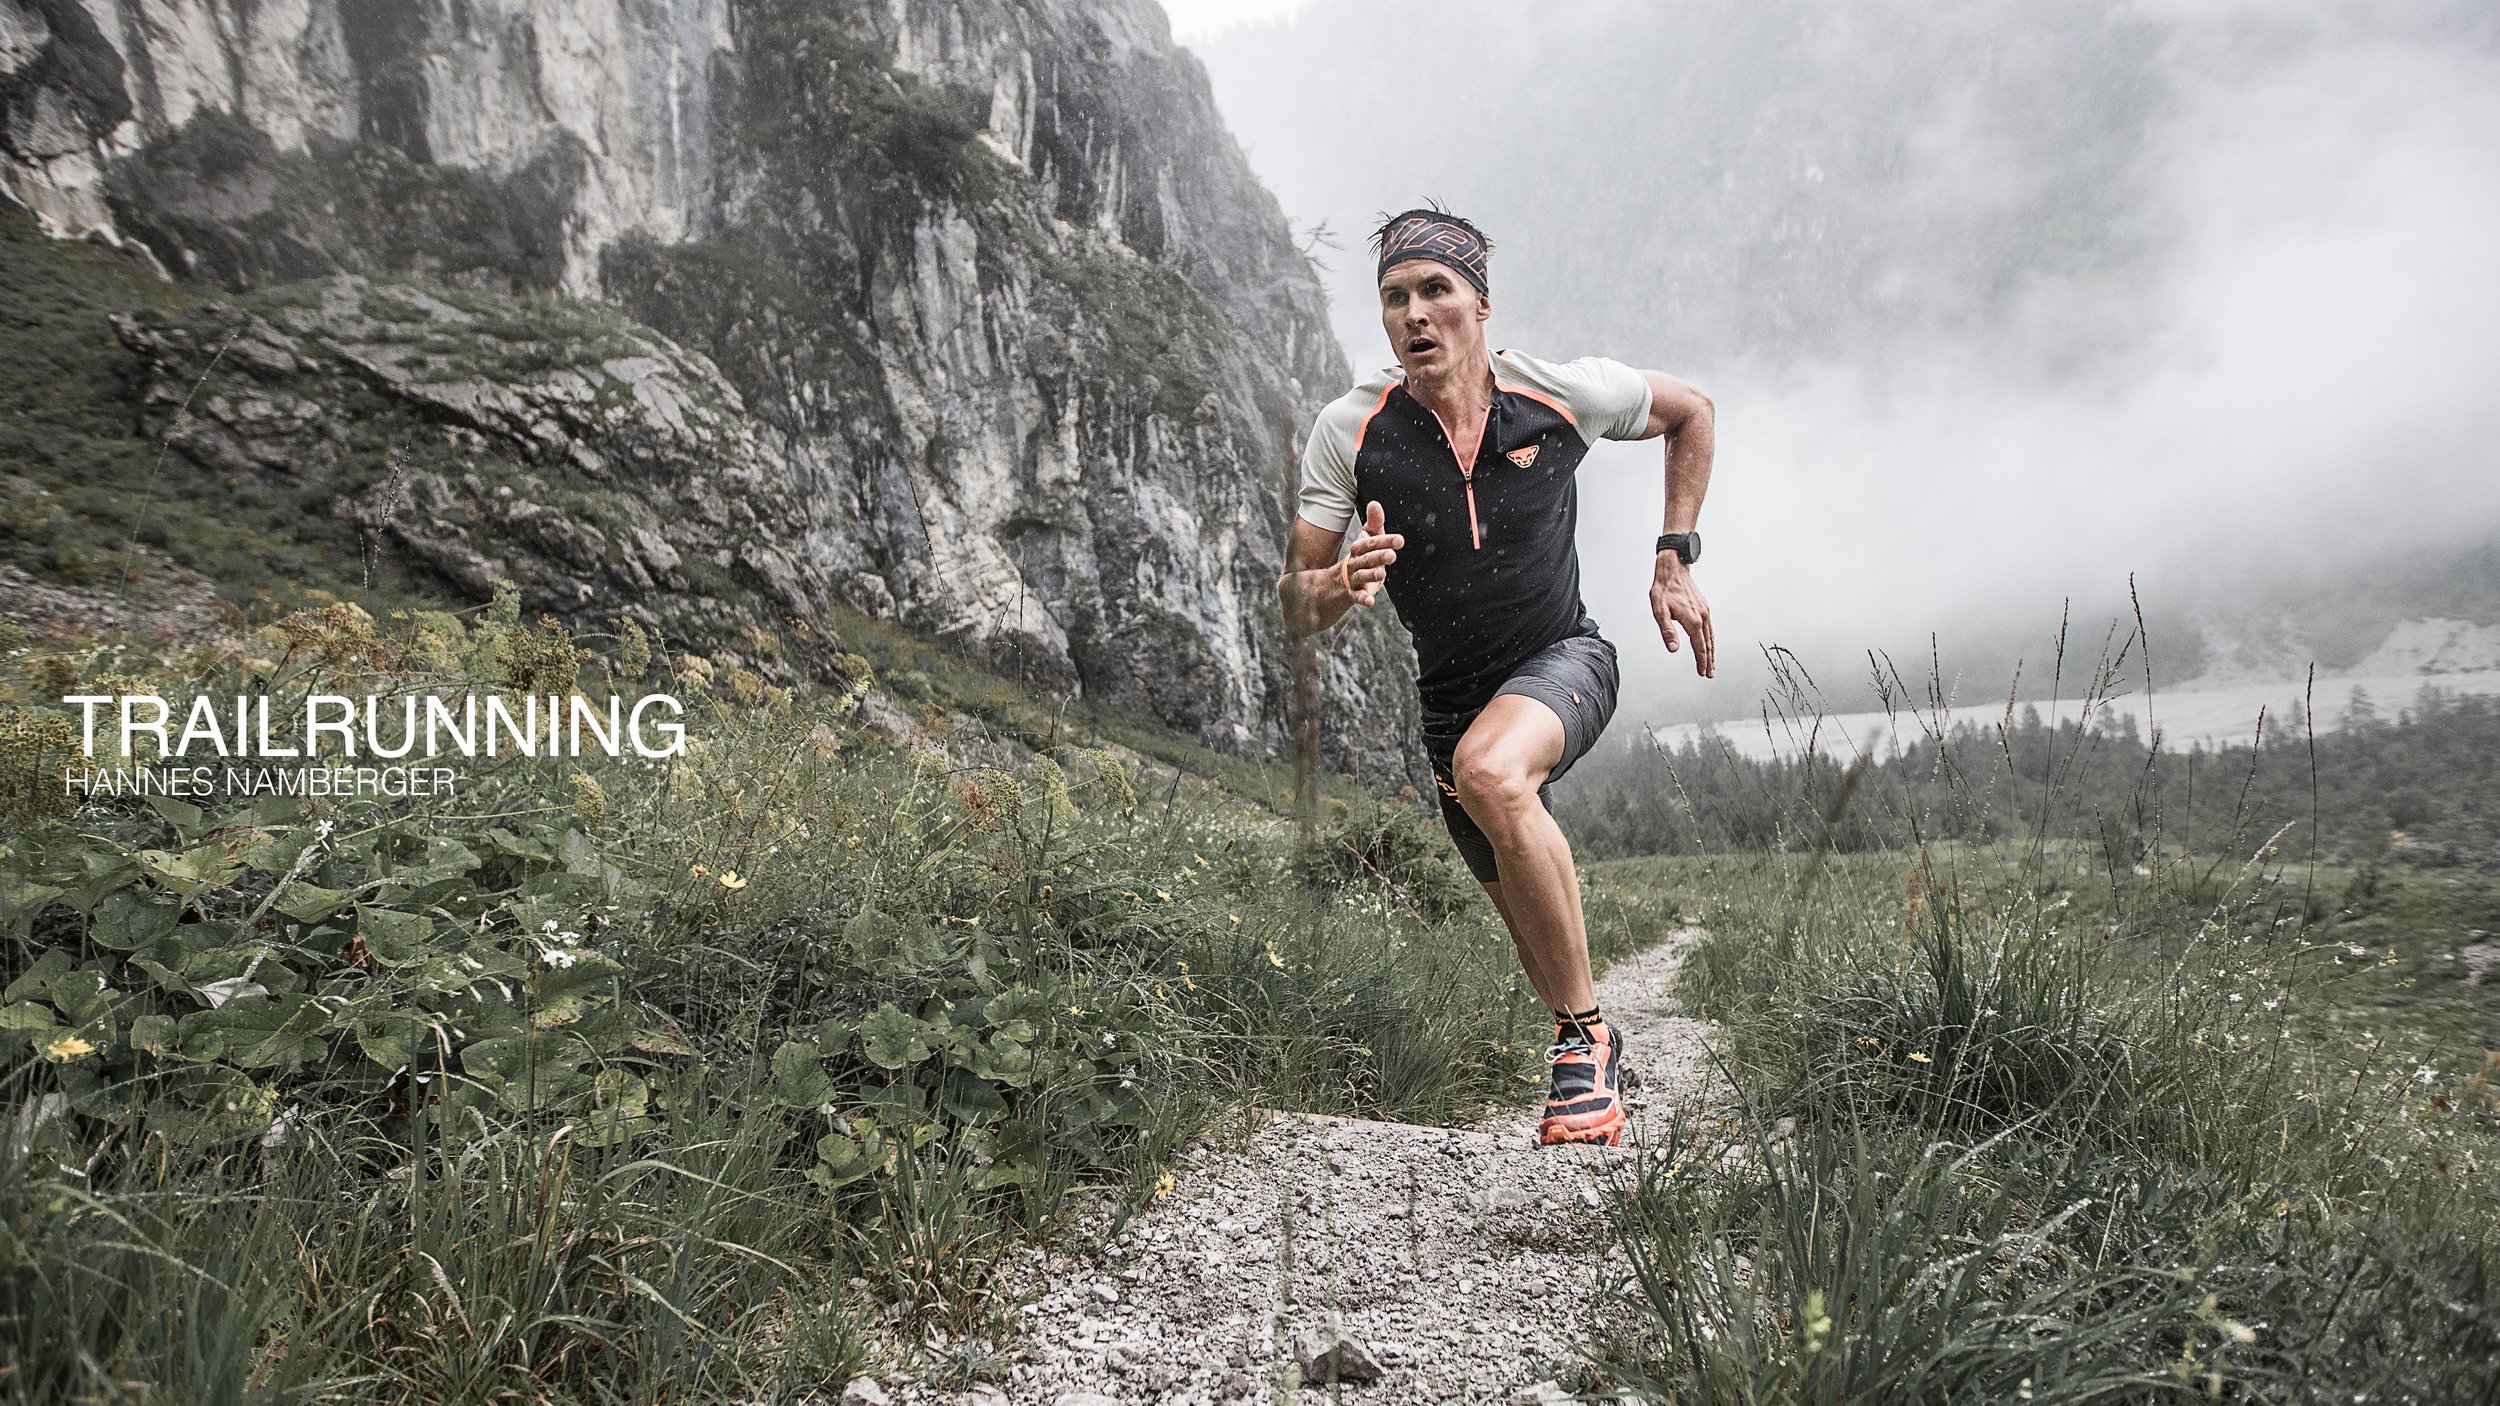 helgeroeske_Hannes_Namberger_Trailrunning.jpg